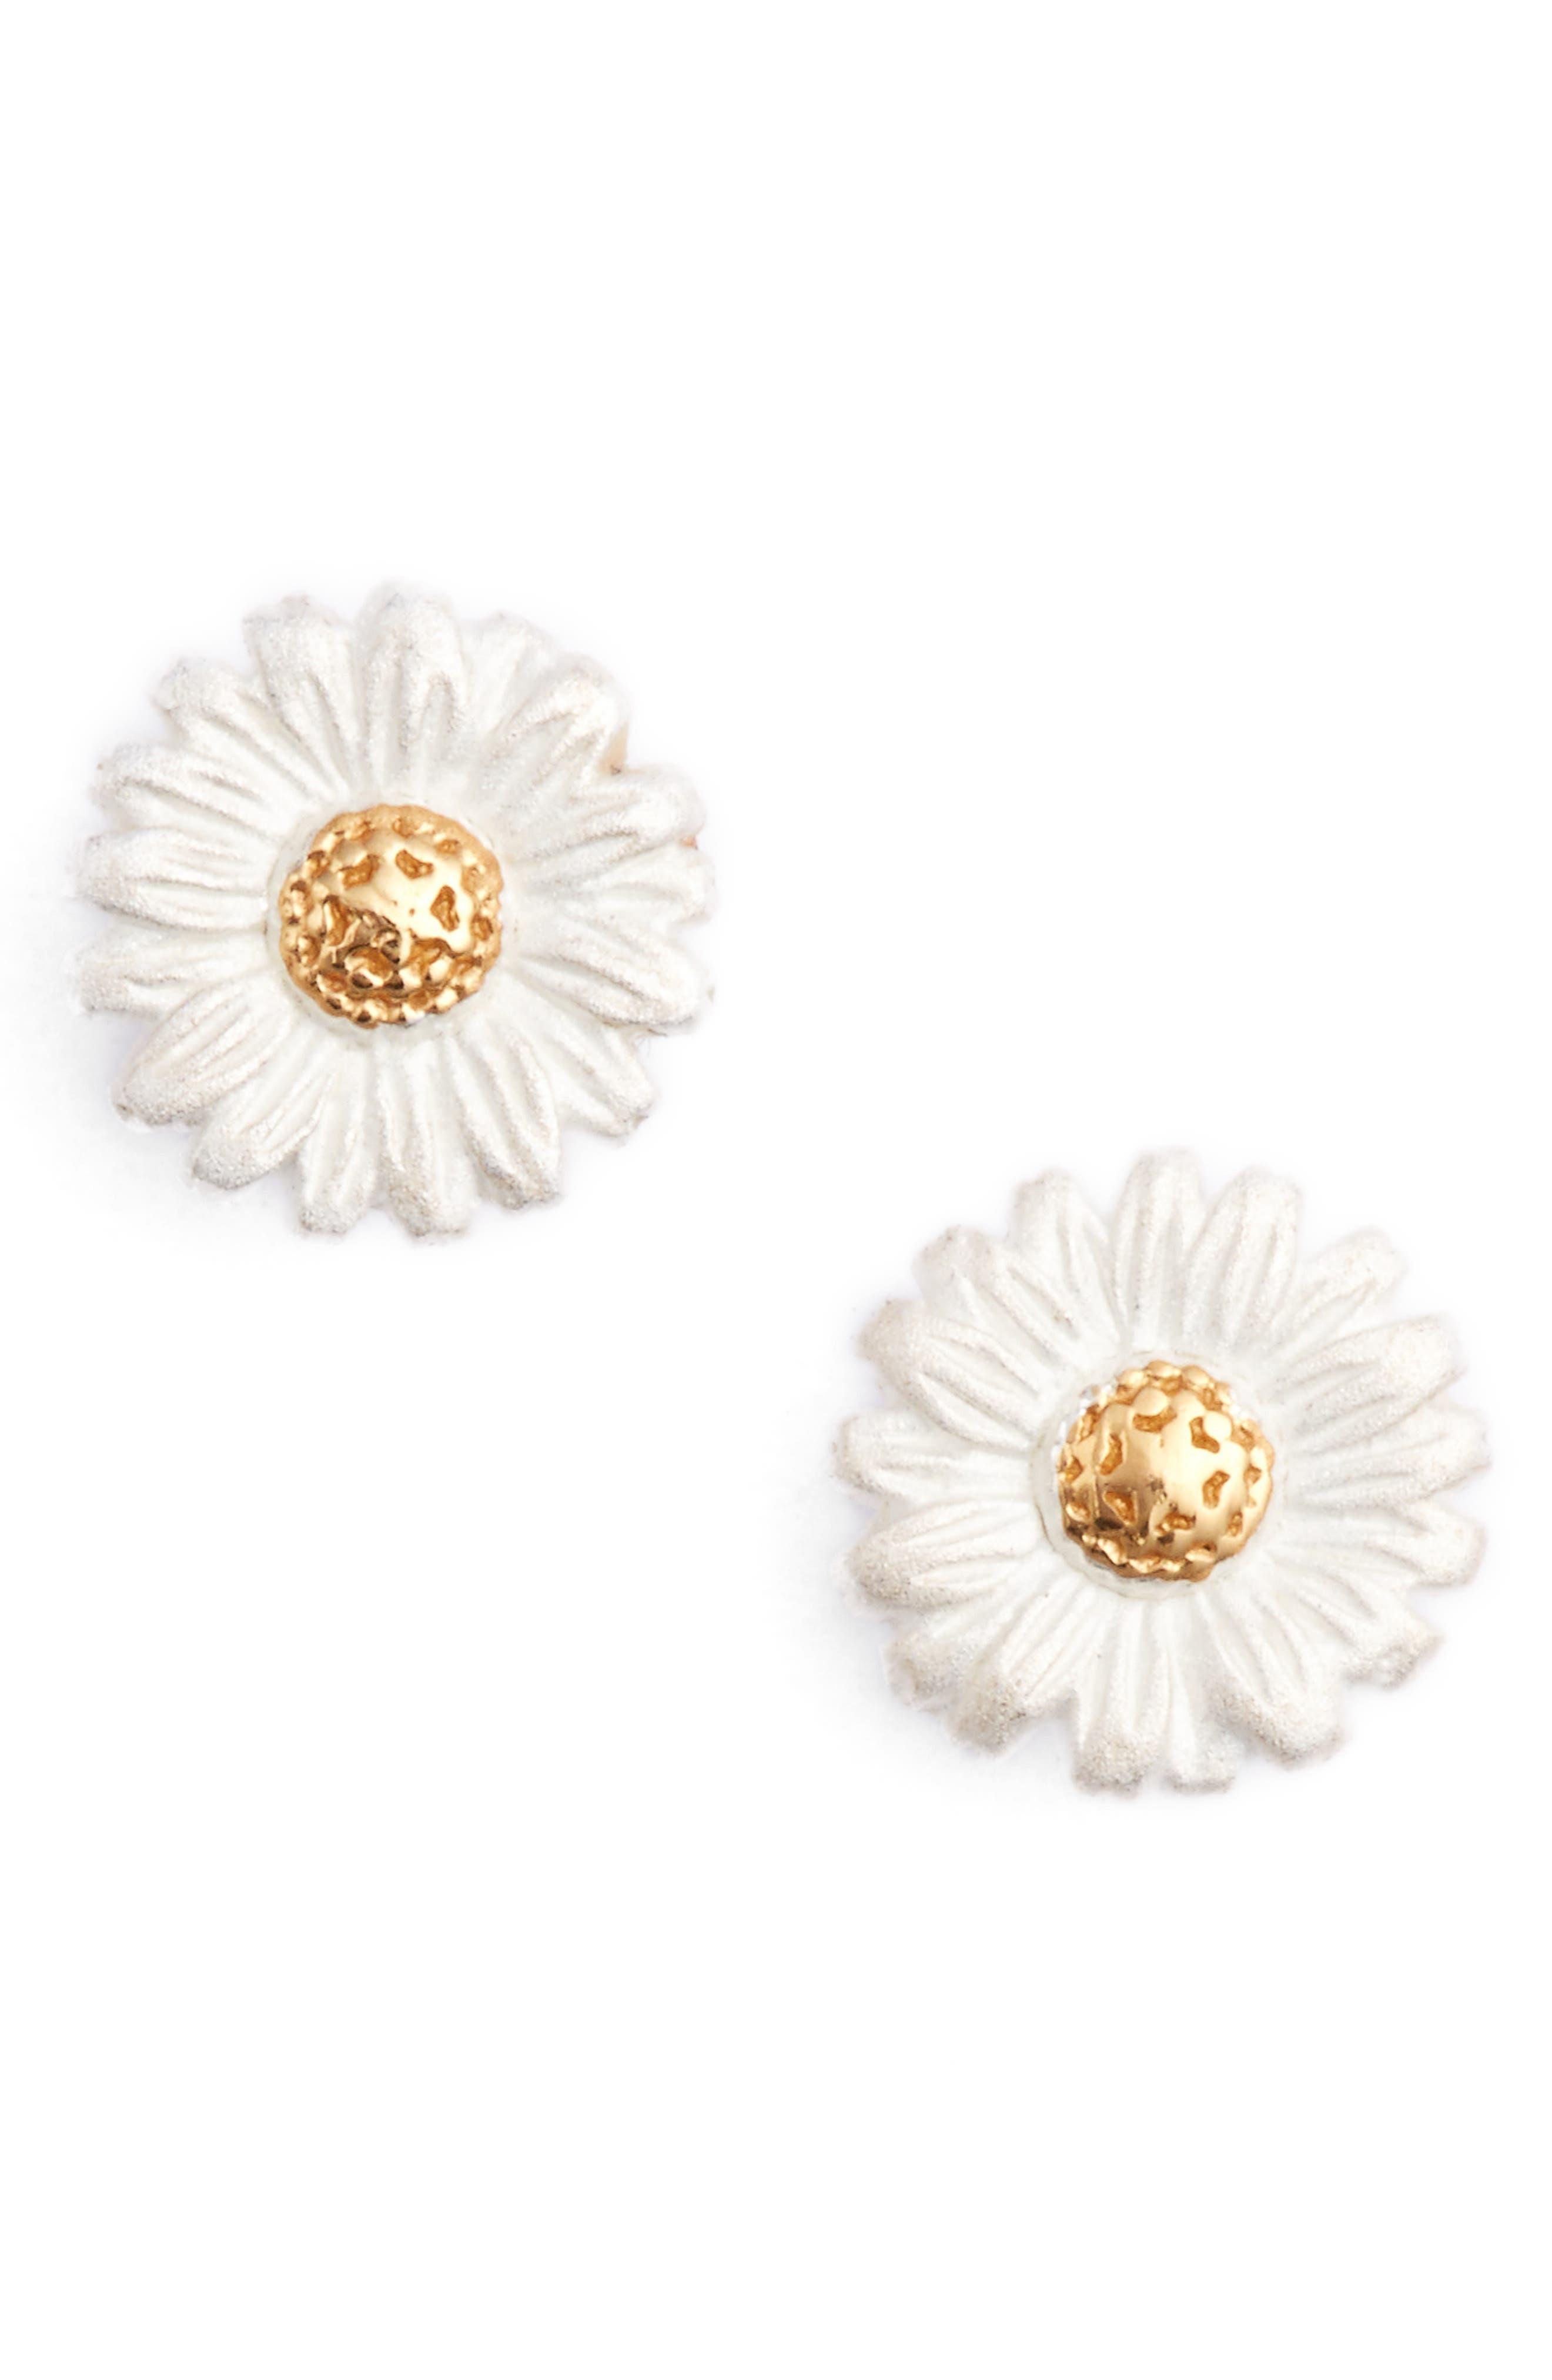 Main Image - Olivia Burton Daisy Stud Earrings